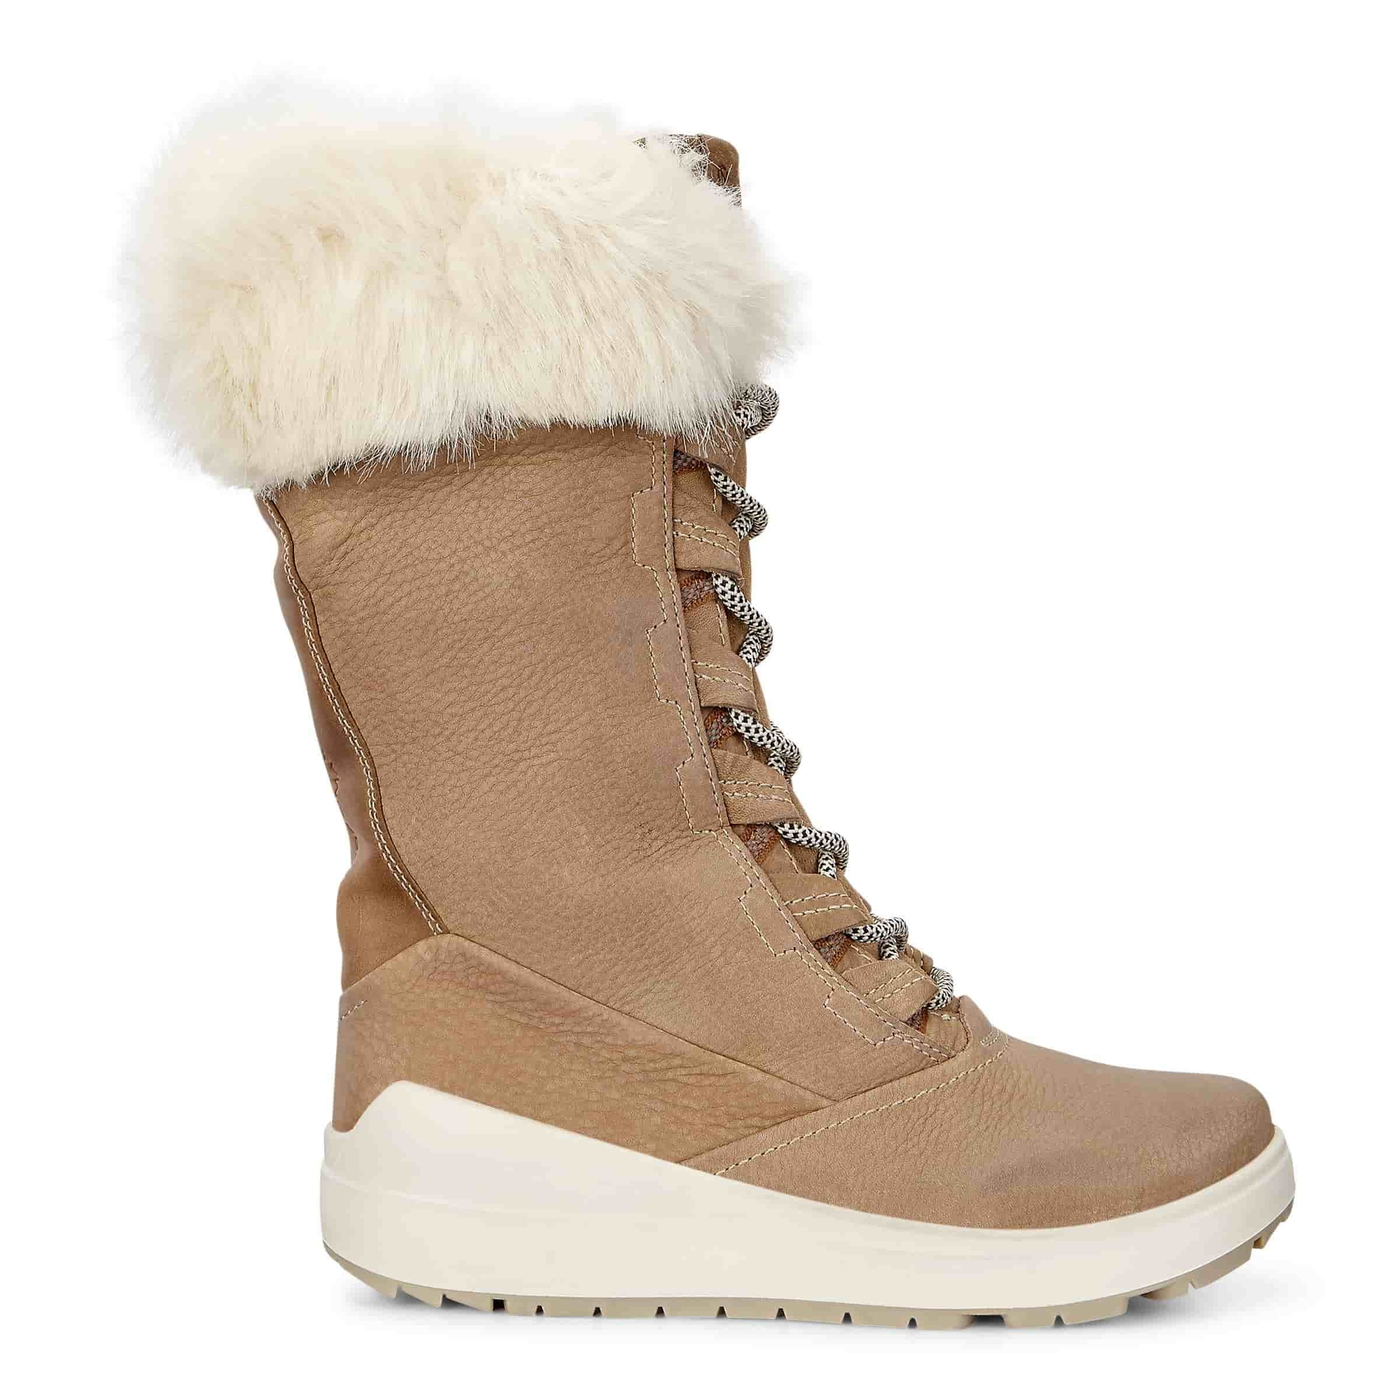 ECCO NOYCE High Lace Boot